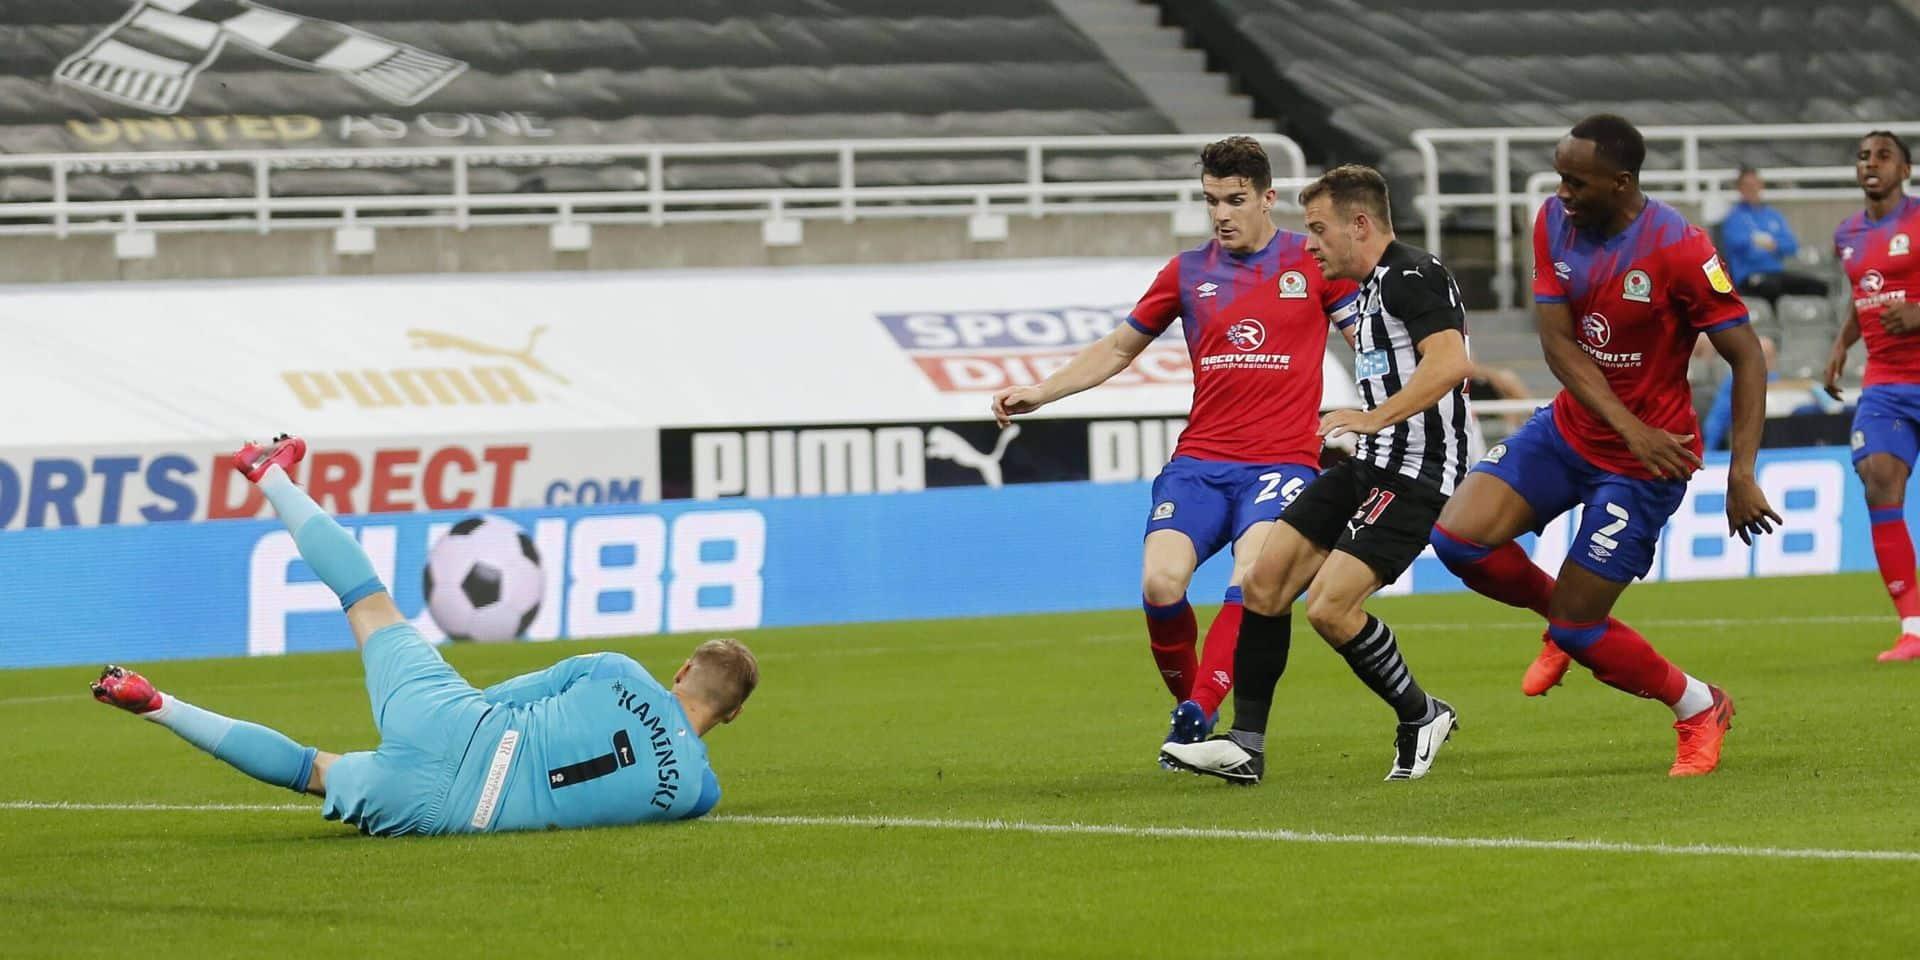 Newcastle United v Blackburn Rovers EFL Cup 15/09/2020. Blackburn Rovers goalkeeper Thomas Kaminski (1) denies Newcastl